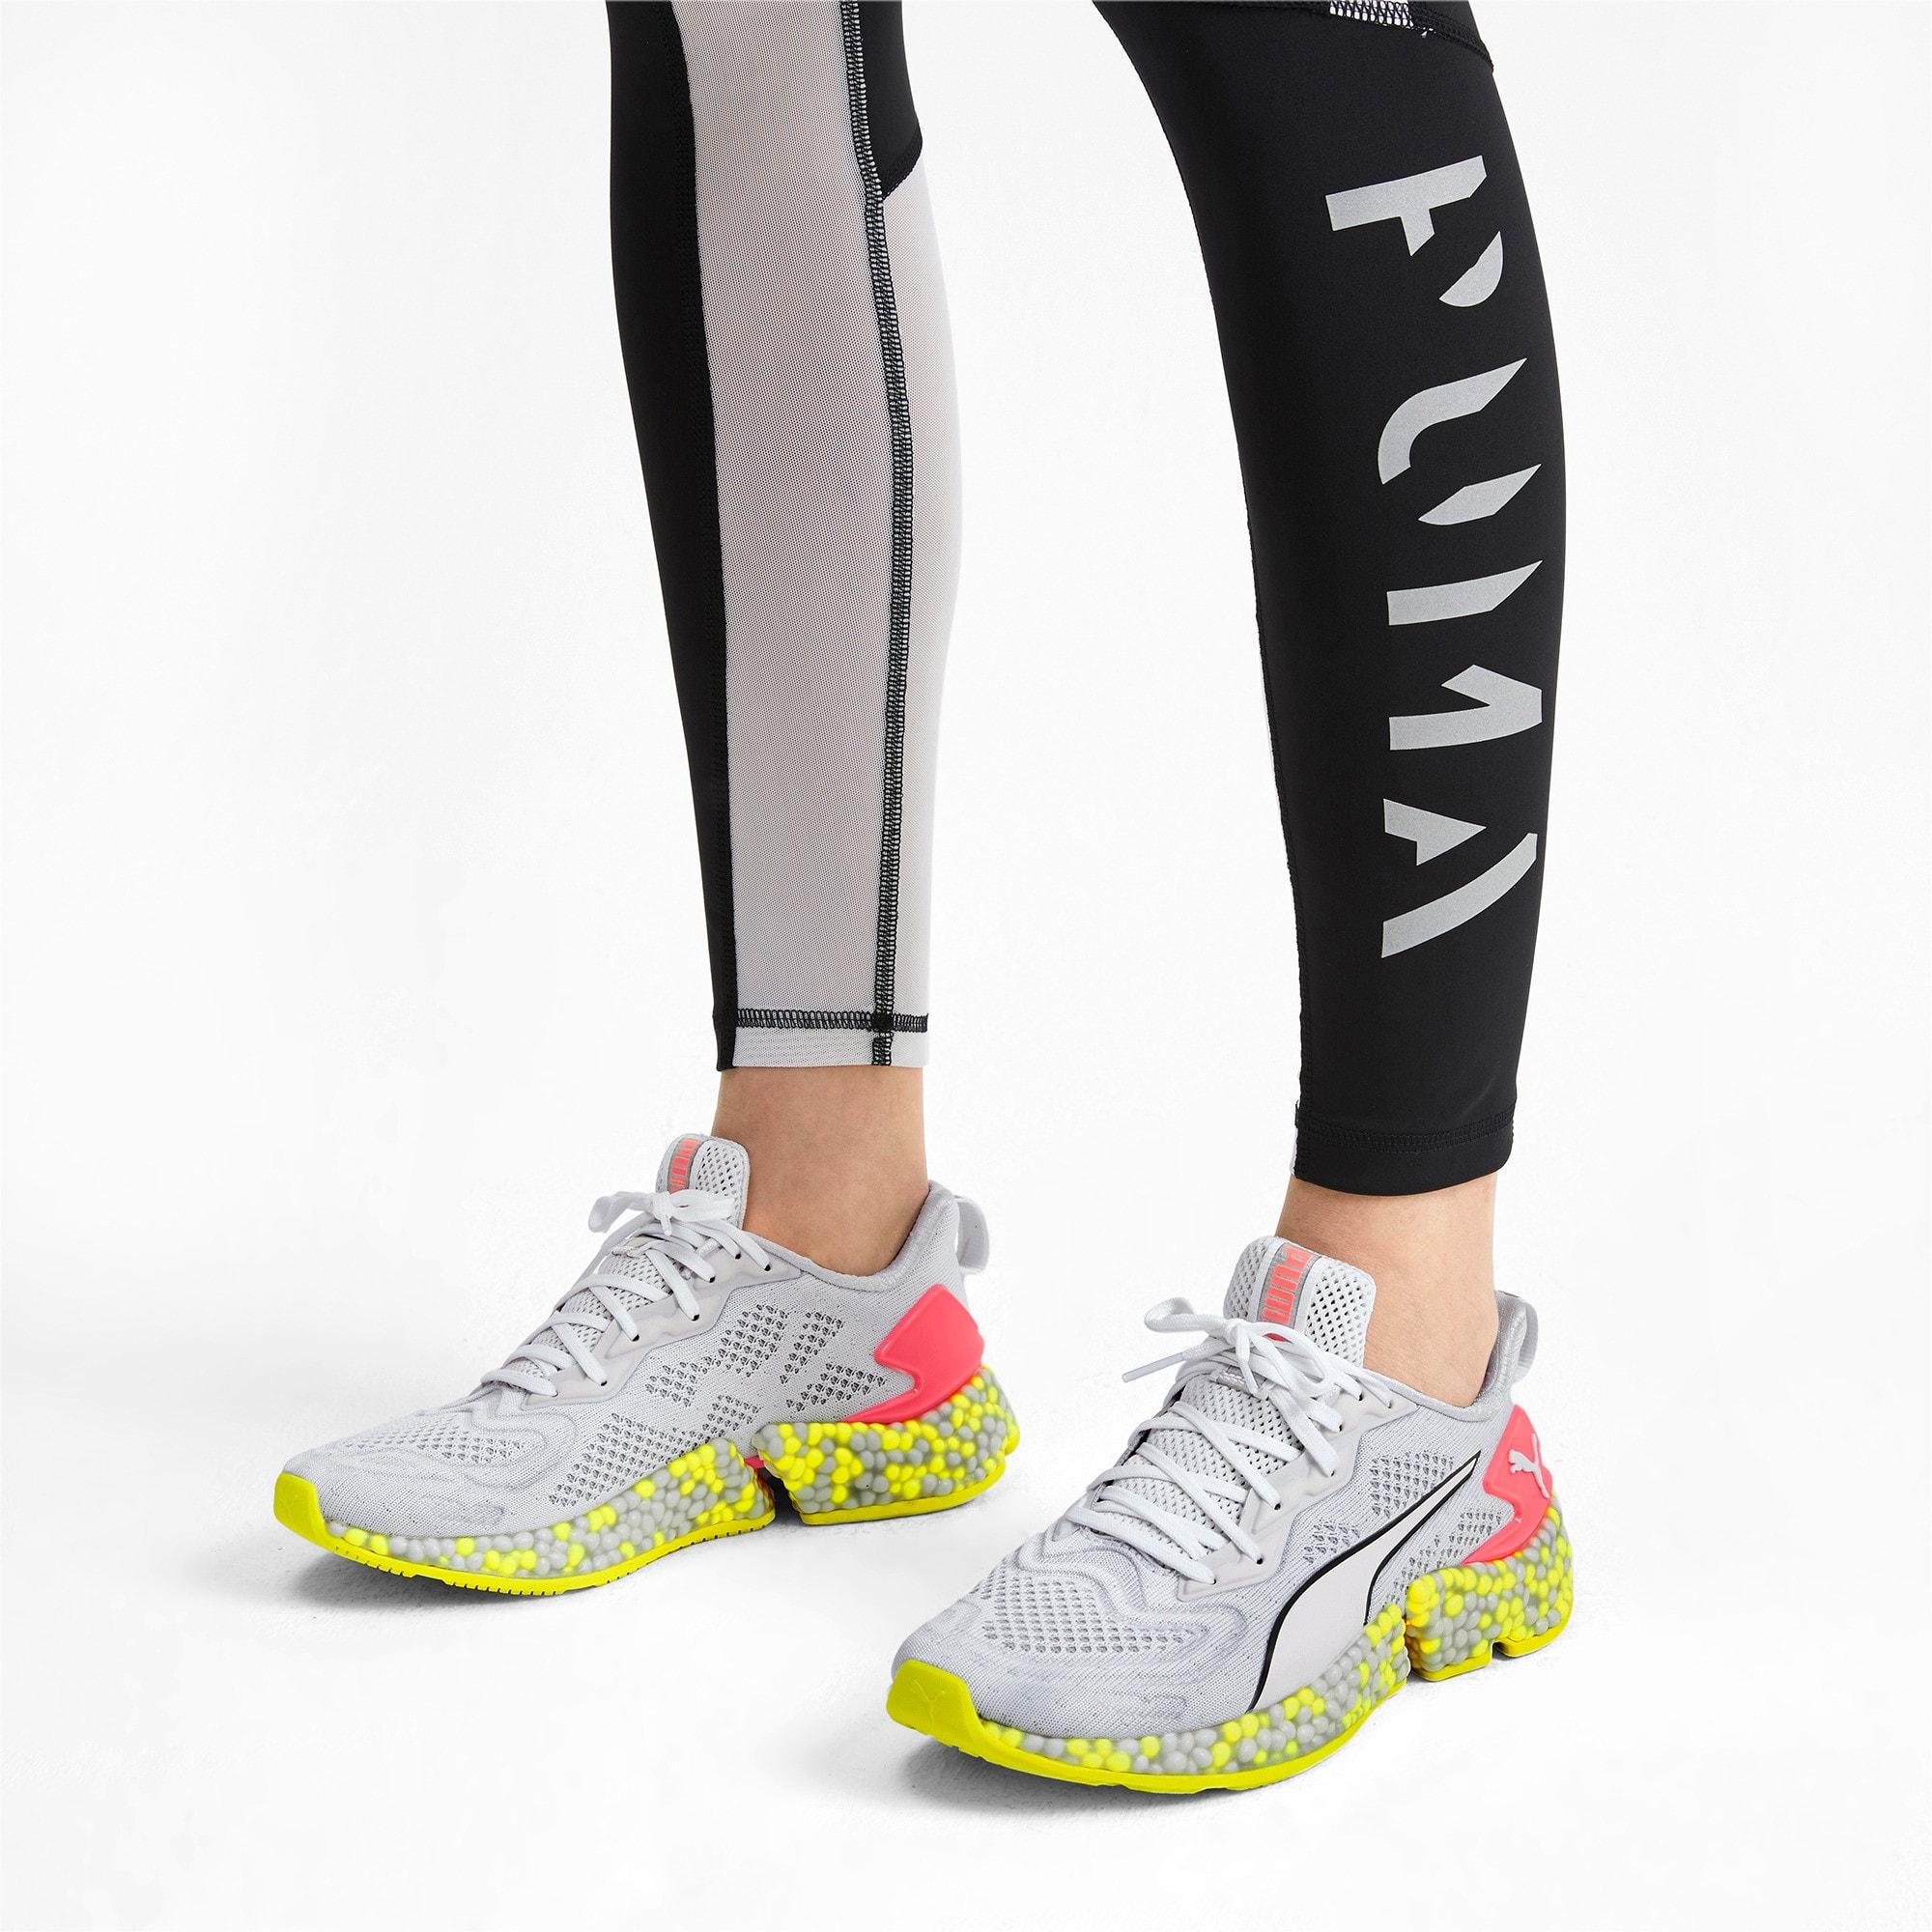 Thumbnail 2 van HYBRID SPEED Orbiter hardloopschoenen voor vrouwen, Puma White-Yellow Alert, medium